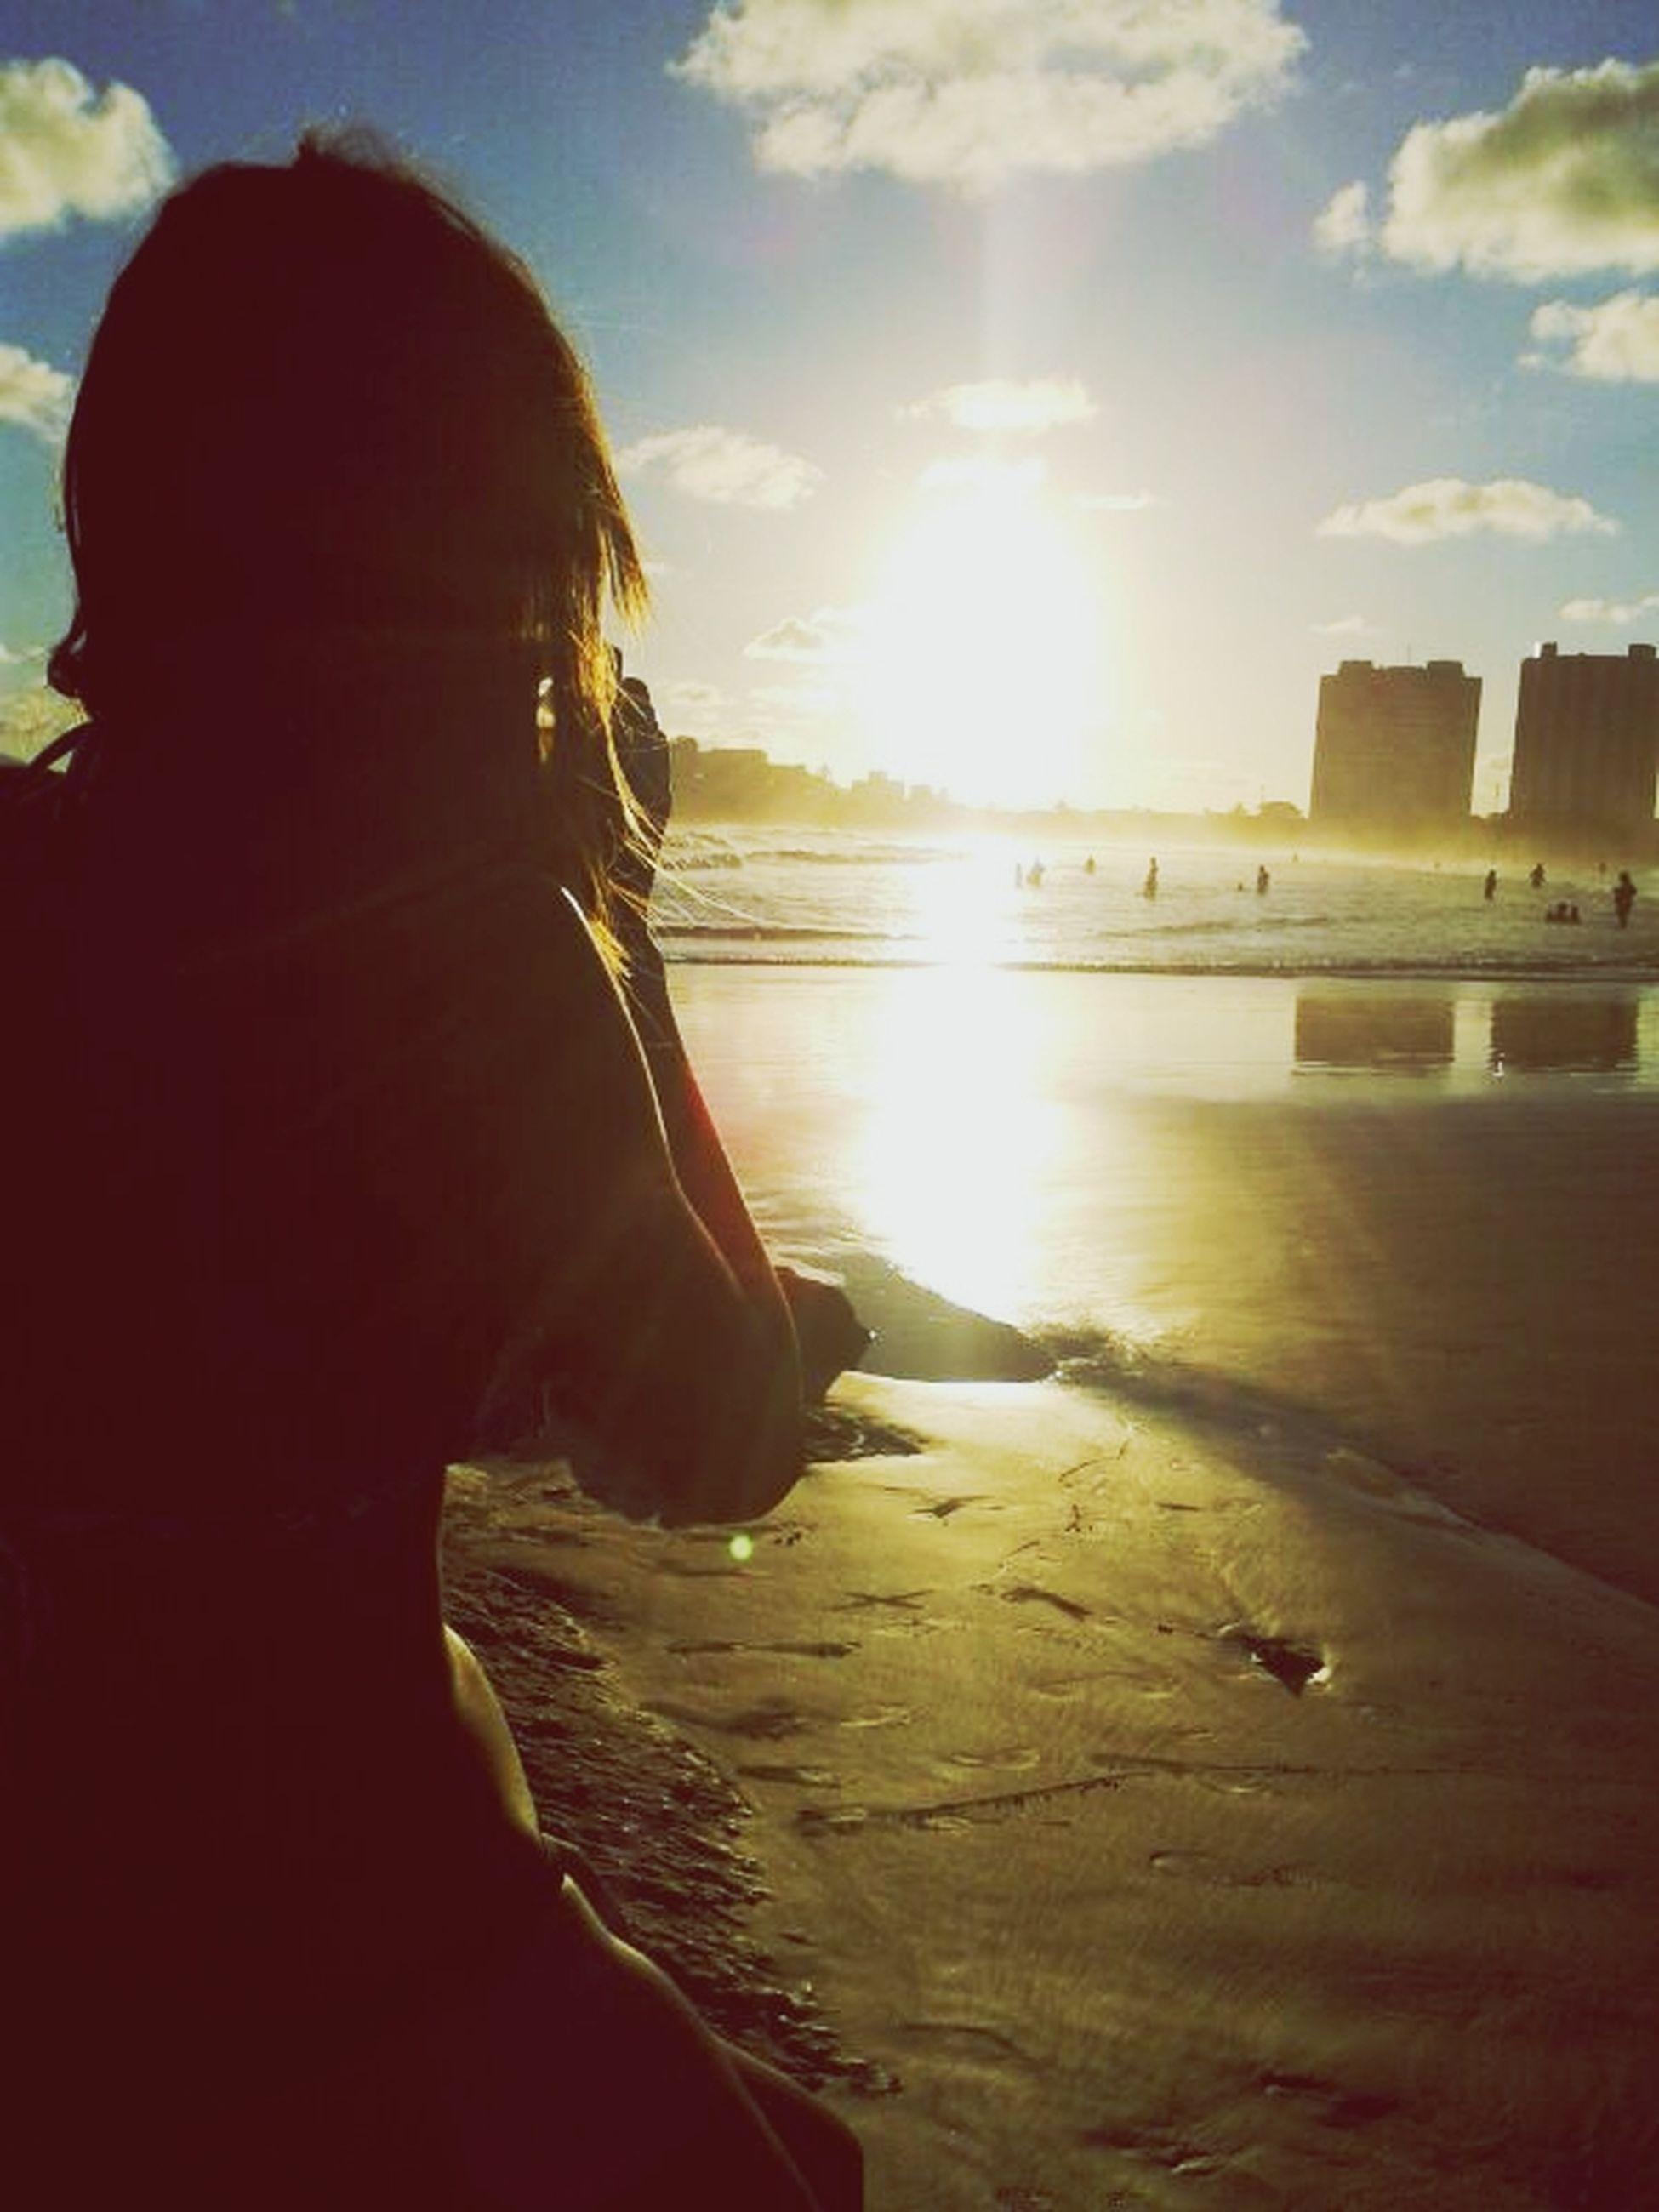 sun, water, sky, sea, sunset, sunlight, sunbeam, beach, lens flare, nature, scenics, tranquility, beauty in nature, tranquil scene, cloud - sky, horizon over water, leisure activity, lifestyles